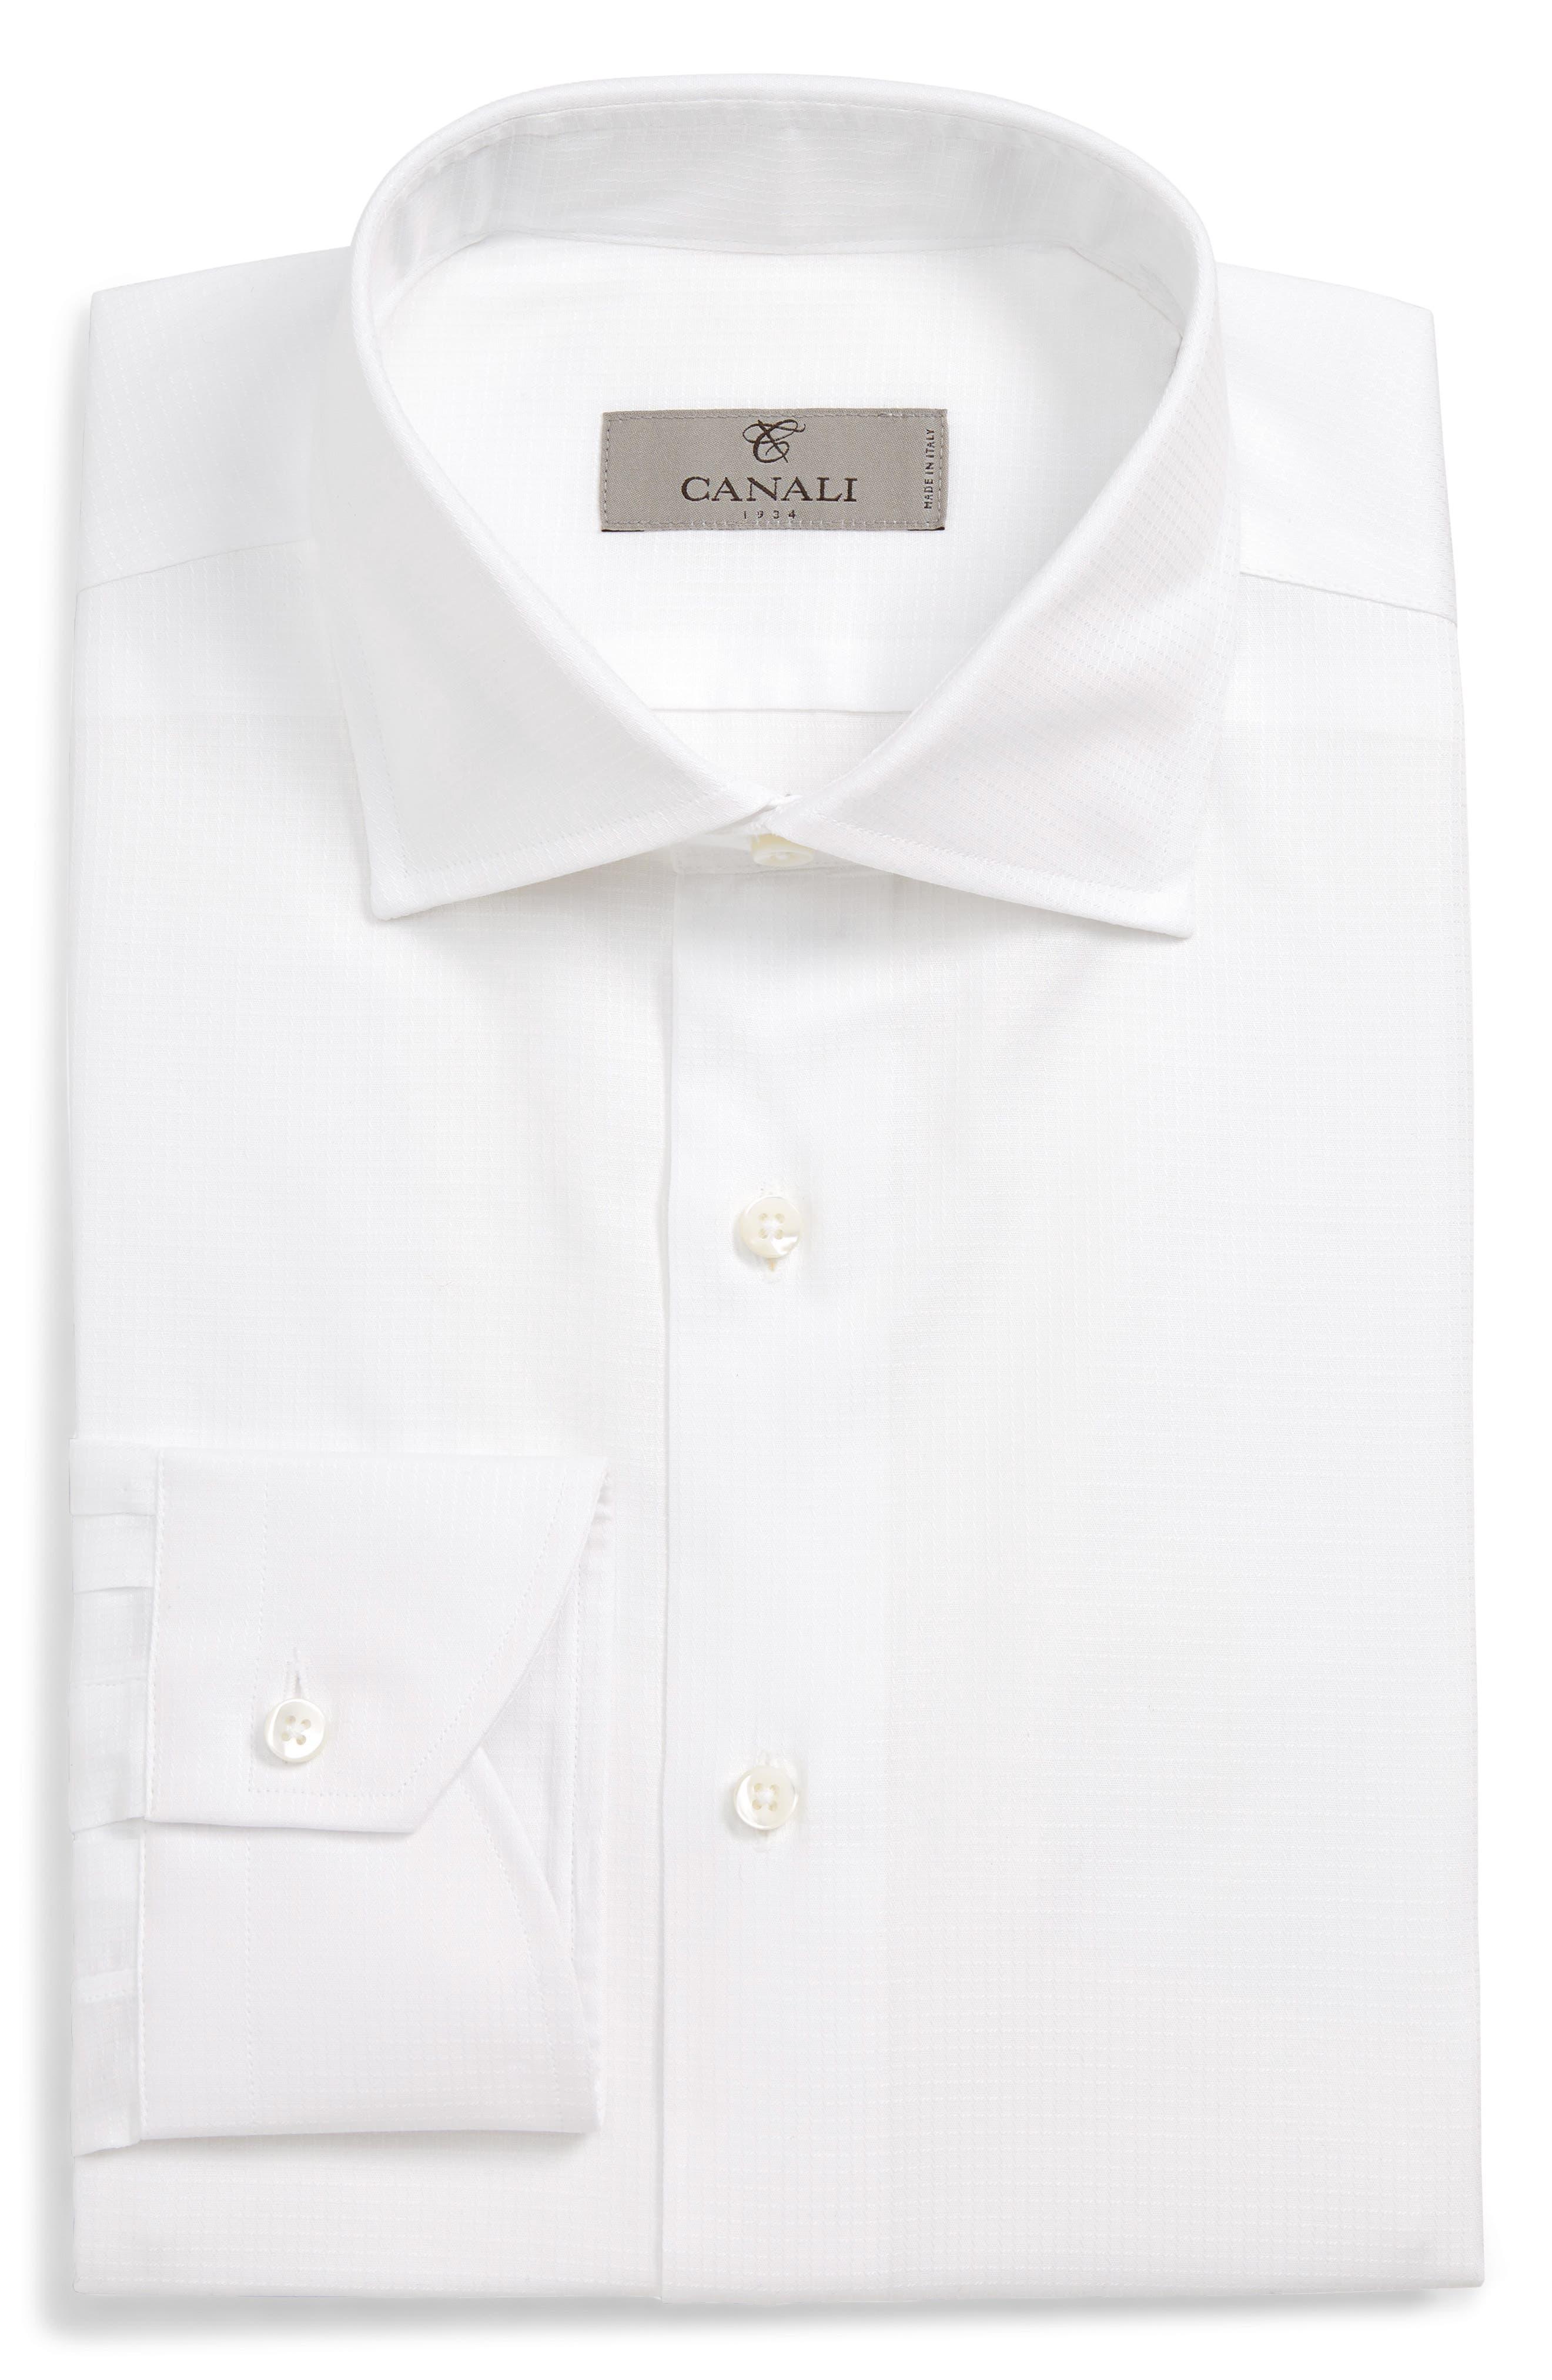 CANALI, Regular Fit Solid Dress Shirt, Main thumbnail 1, color, WHITE